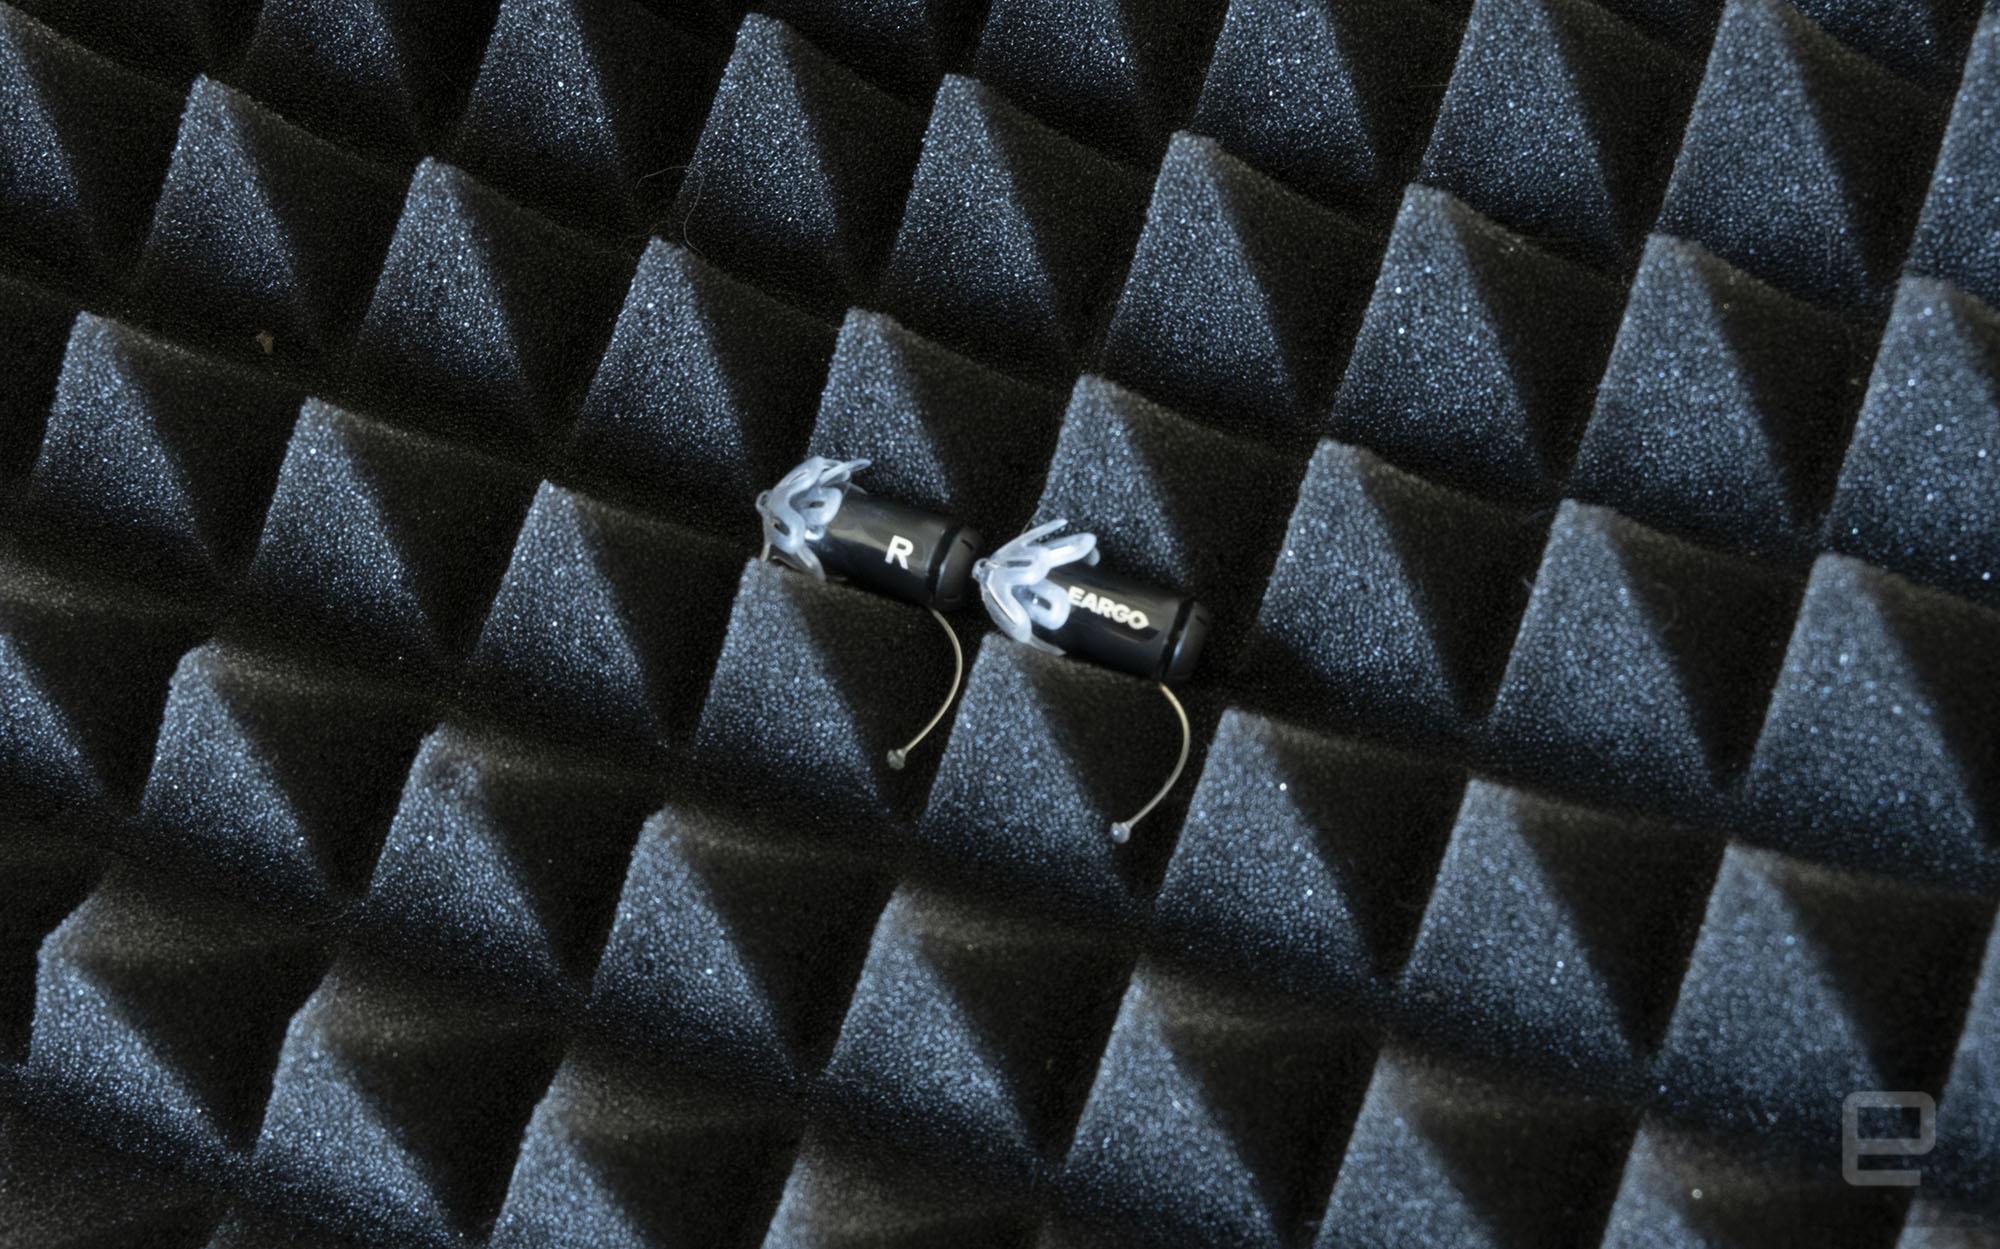 Eargo 5 smart hearing aid.